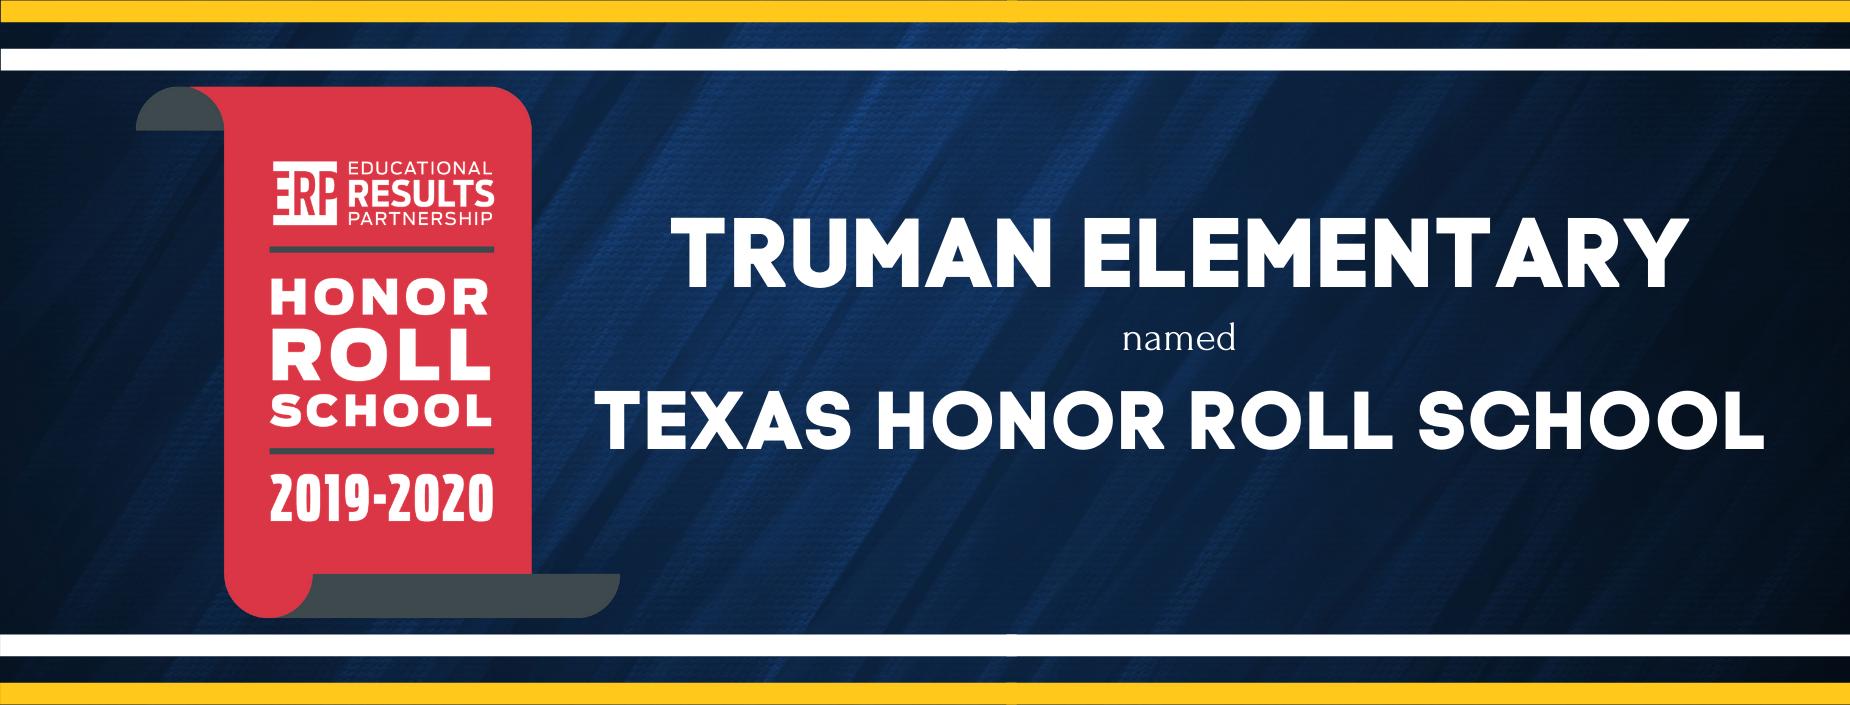 Truman Elementary named Texas Honor Roll School